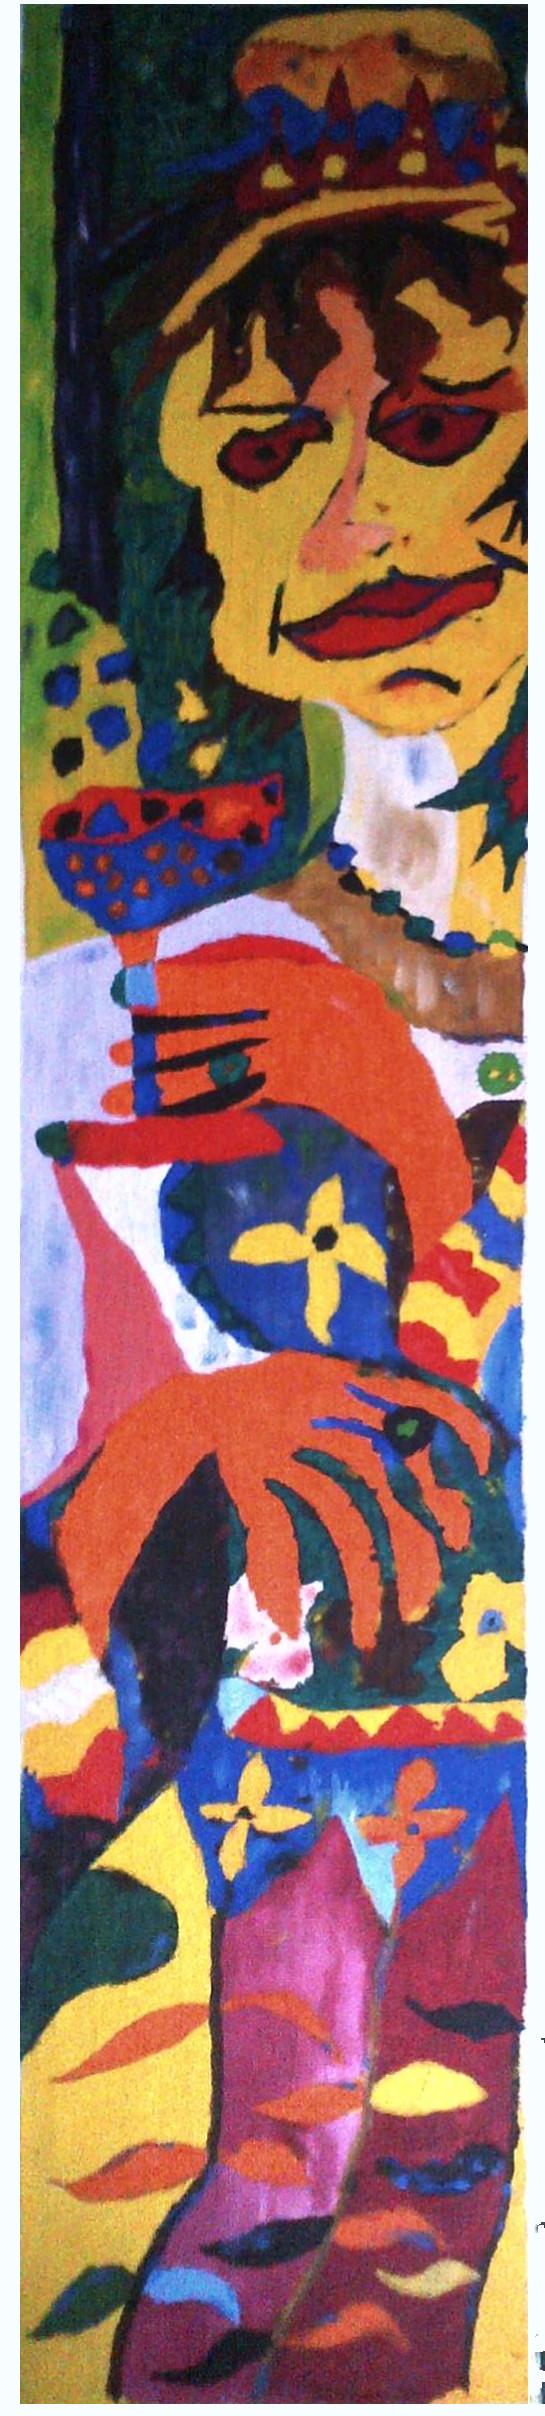 Gerald Shepherd - Almost Untitled